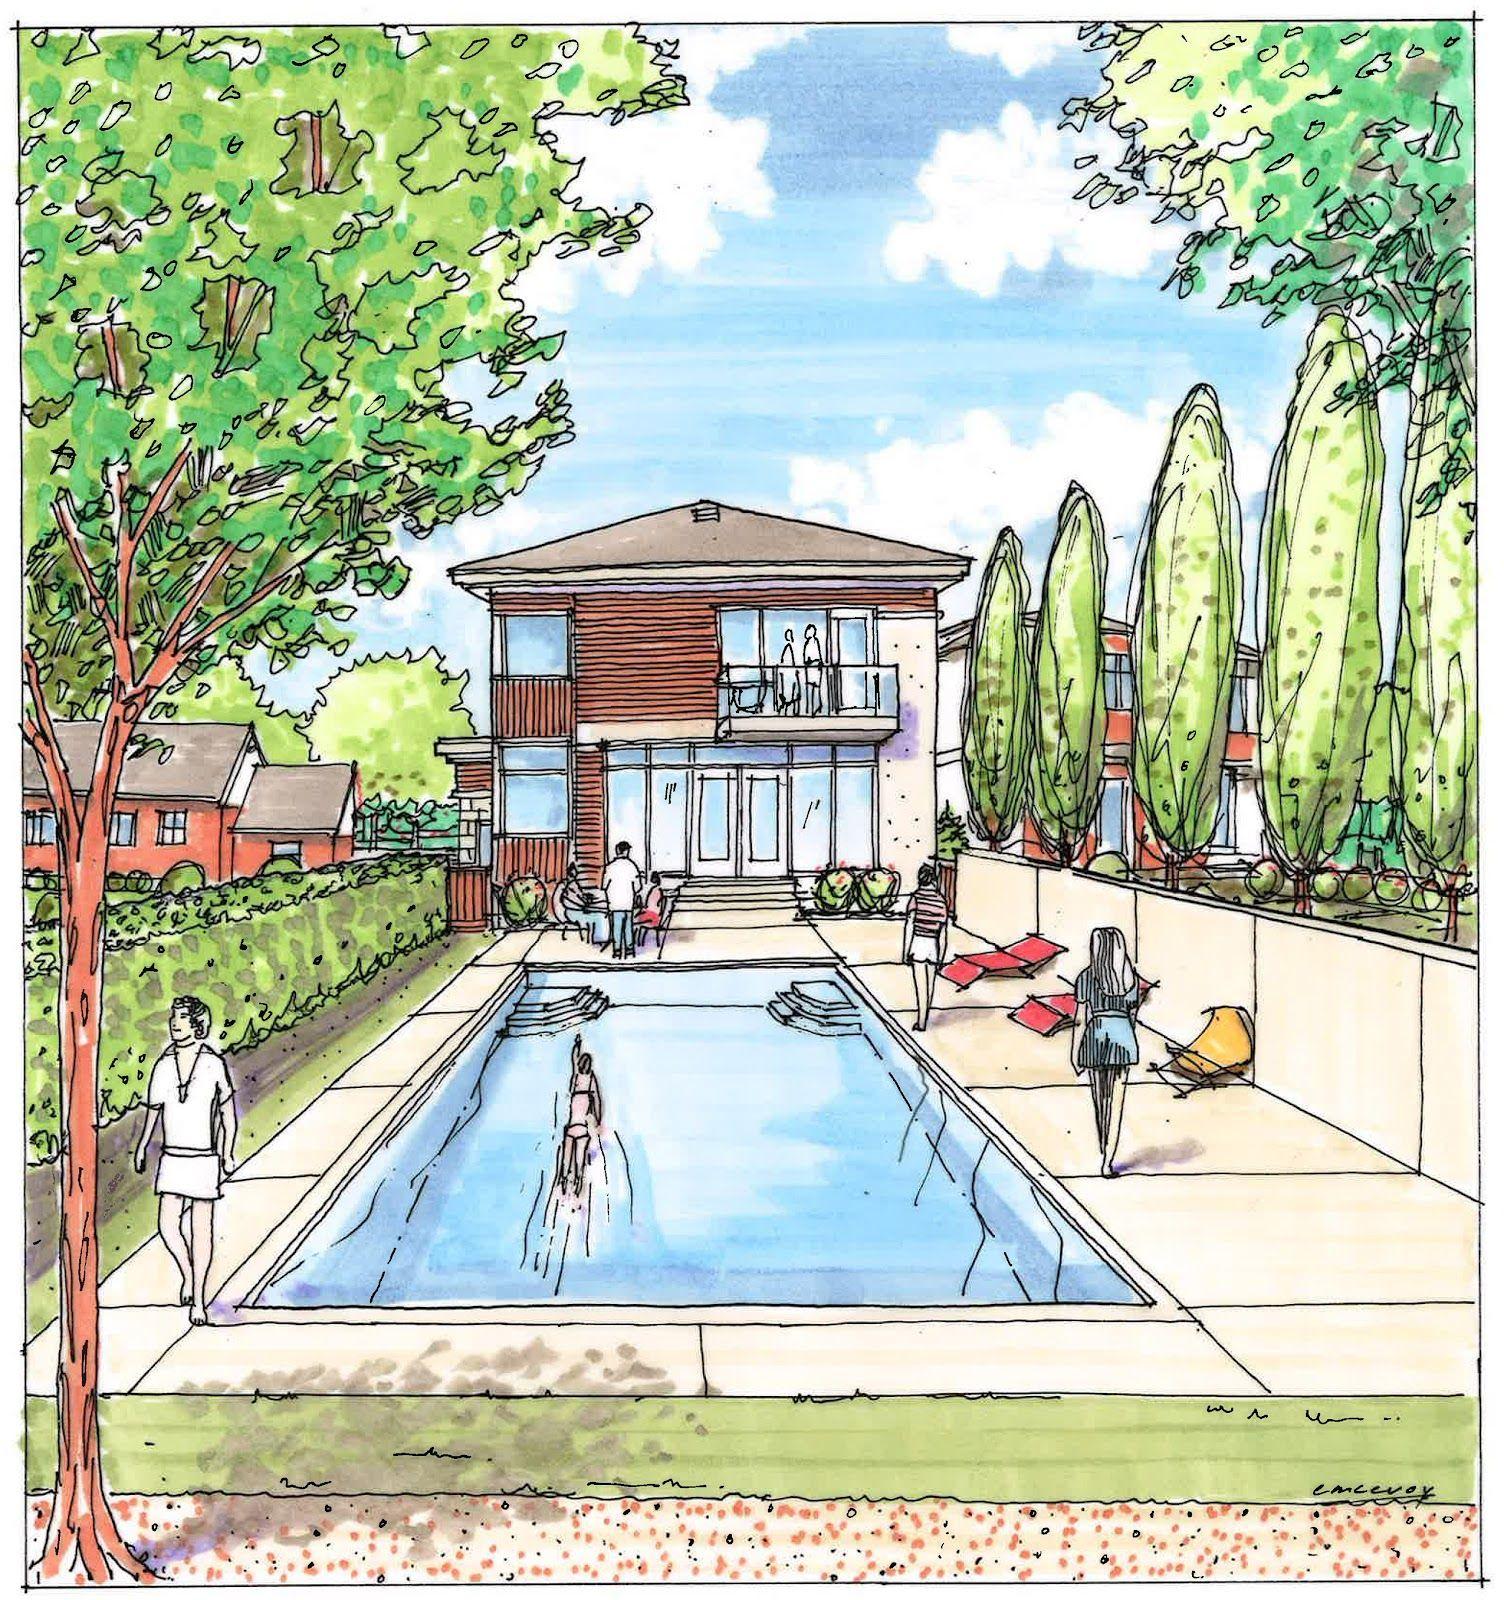 Bay area landscape architects - Landscape Design